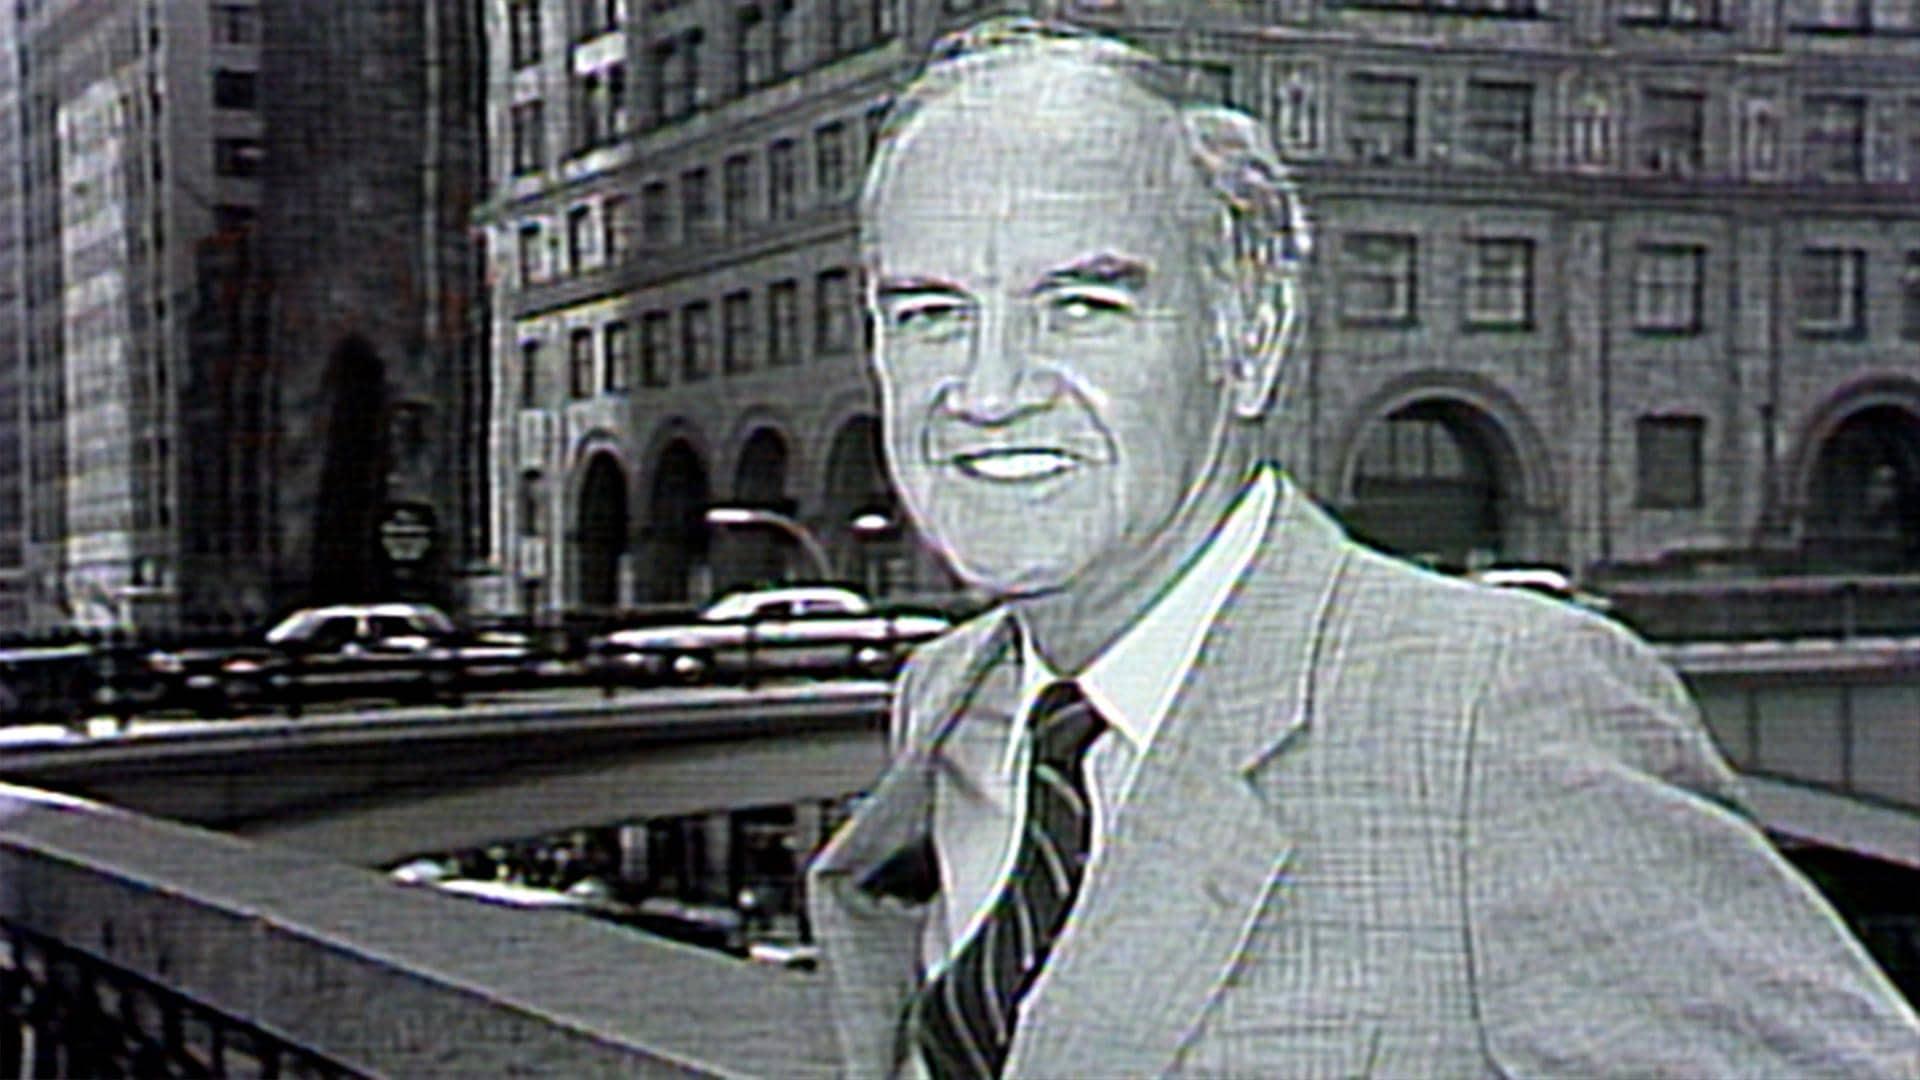 George McGovern: April 14, 1984